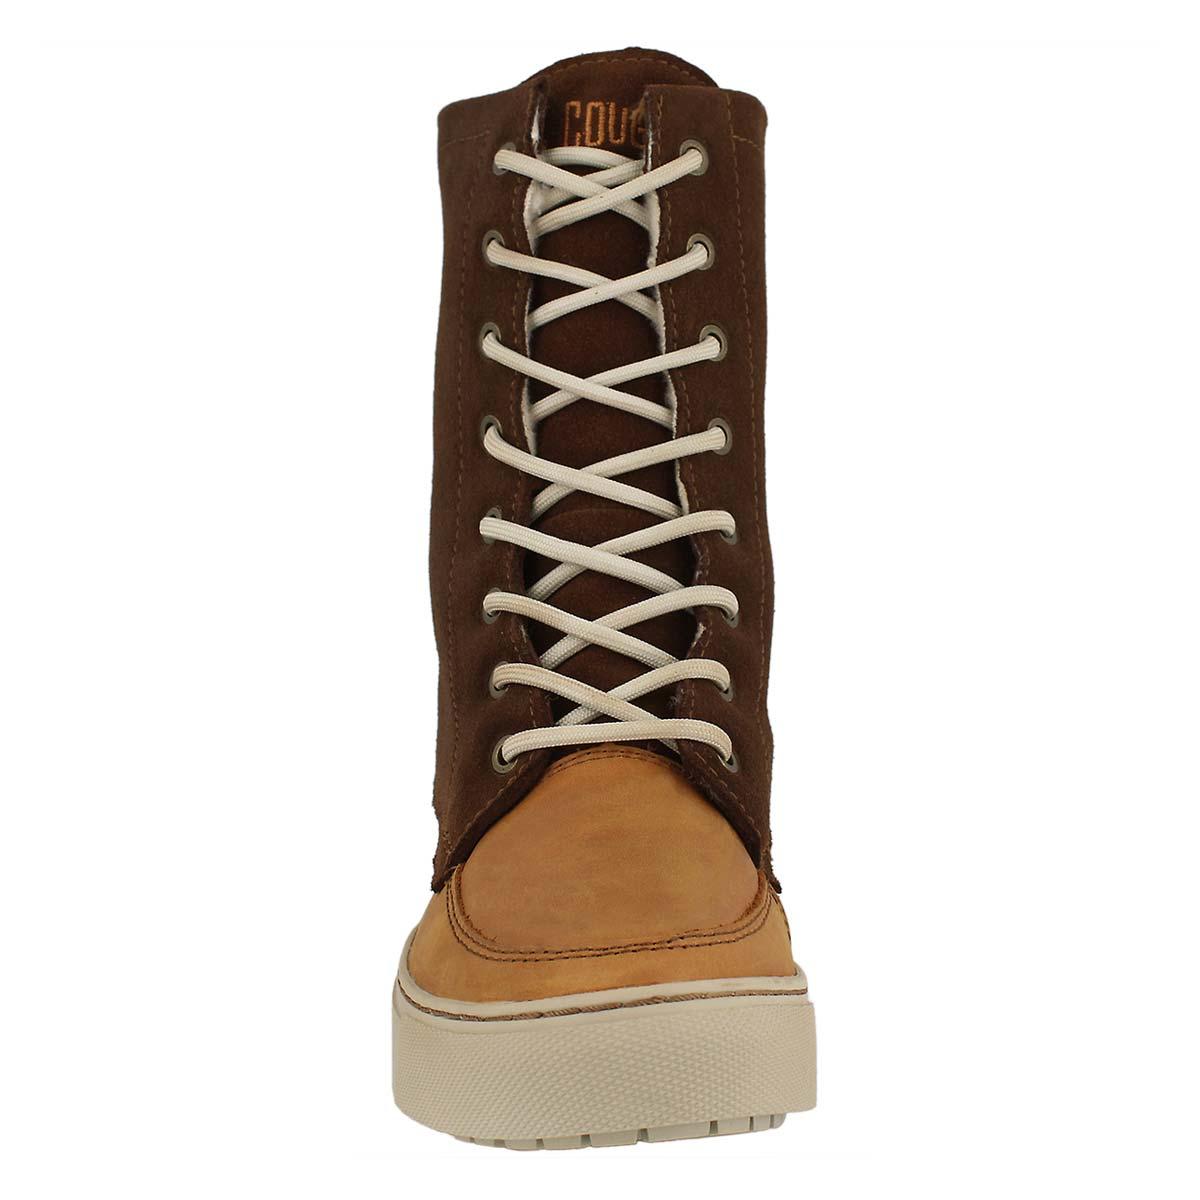 Lds Donato amb/ches wtpf foldover boot